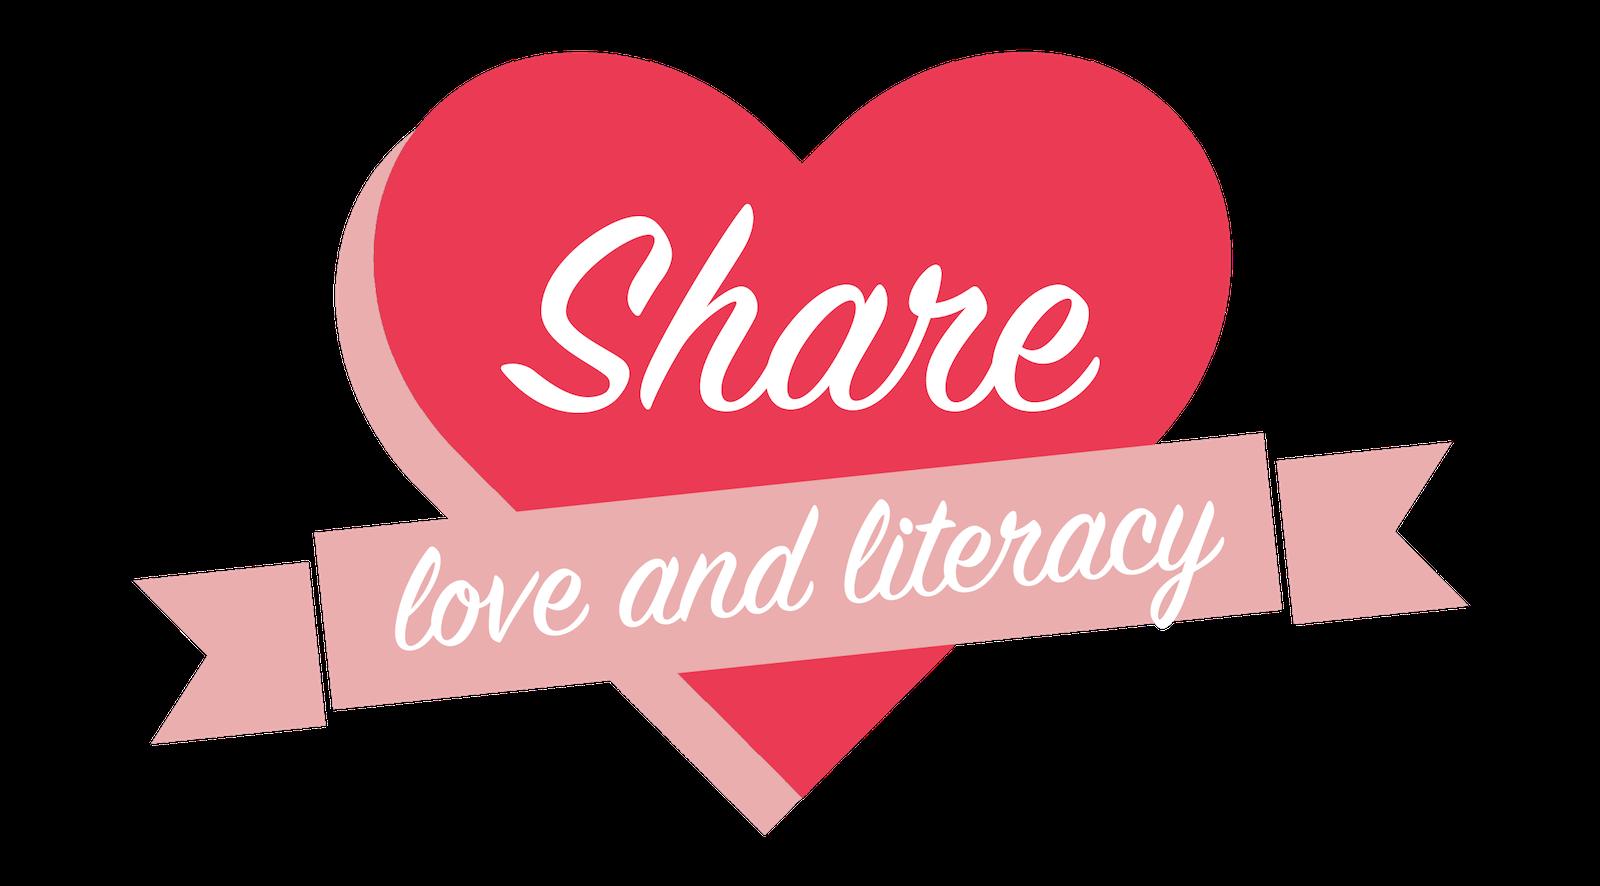 Send Valentine's Day ecards through a charitable organization.